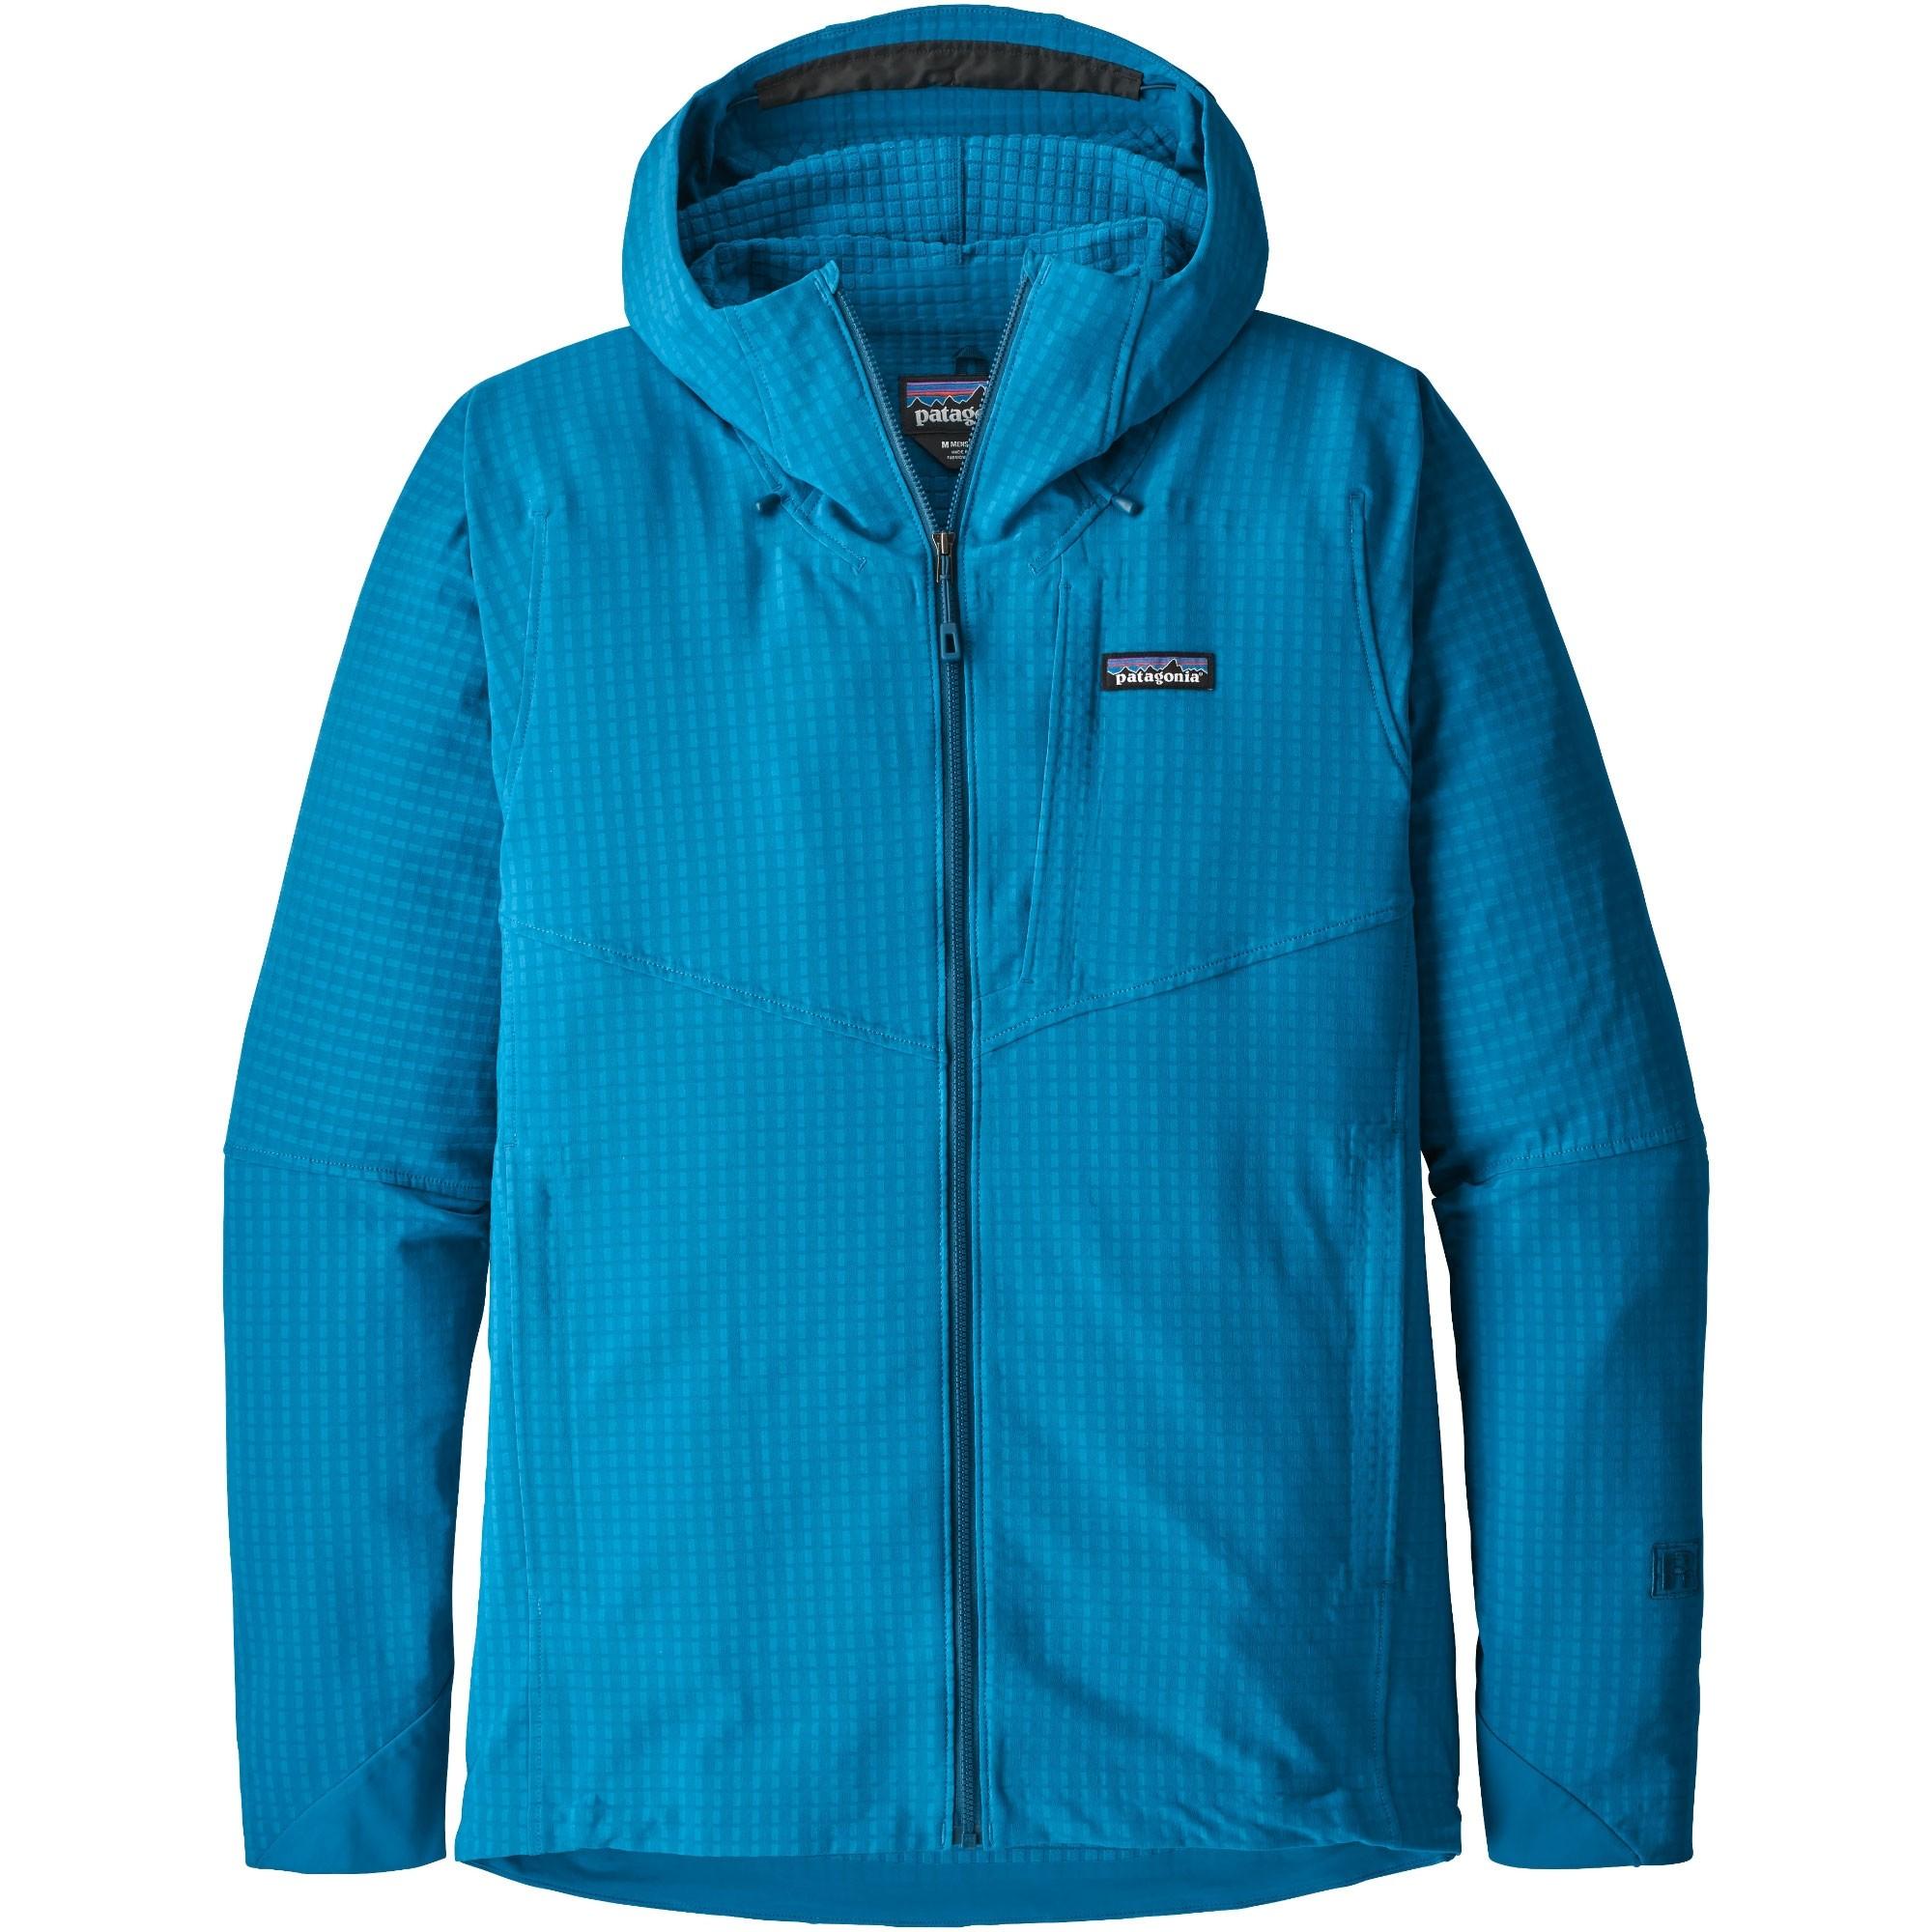 Patagonia R1 TechFace Hoody - Balkan Blue